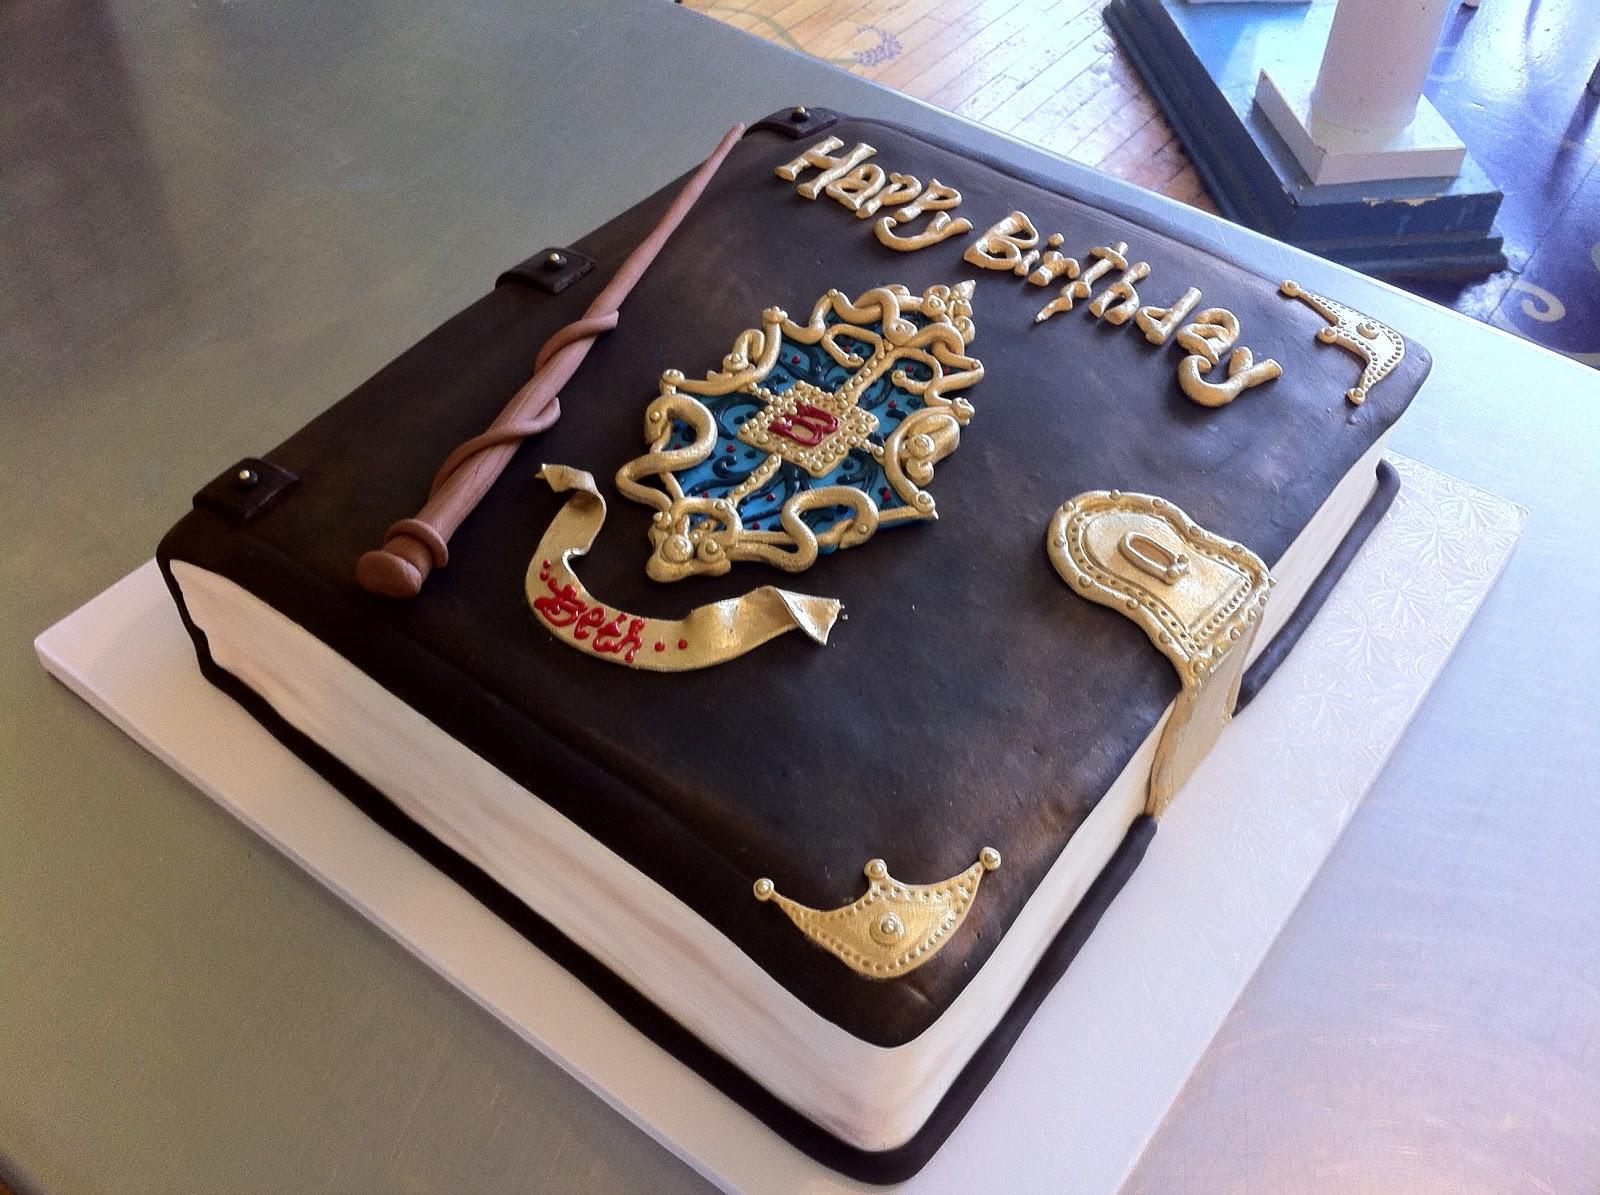 Harry Potter Birthday Cake Asda Jpeg 1024 215 768 9th